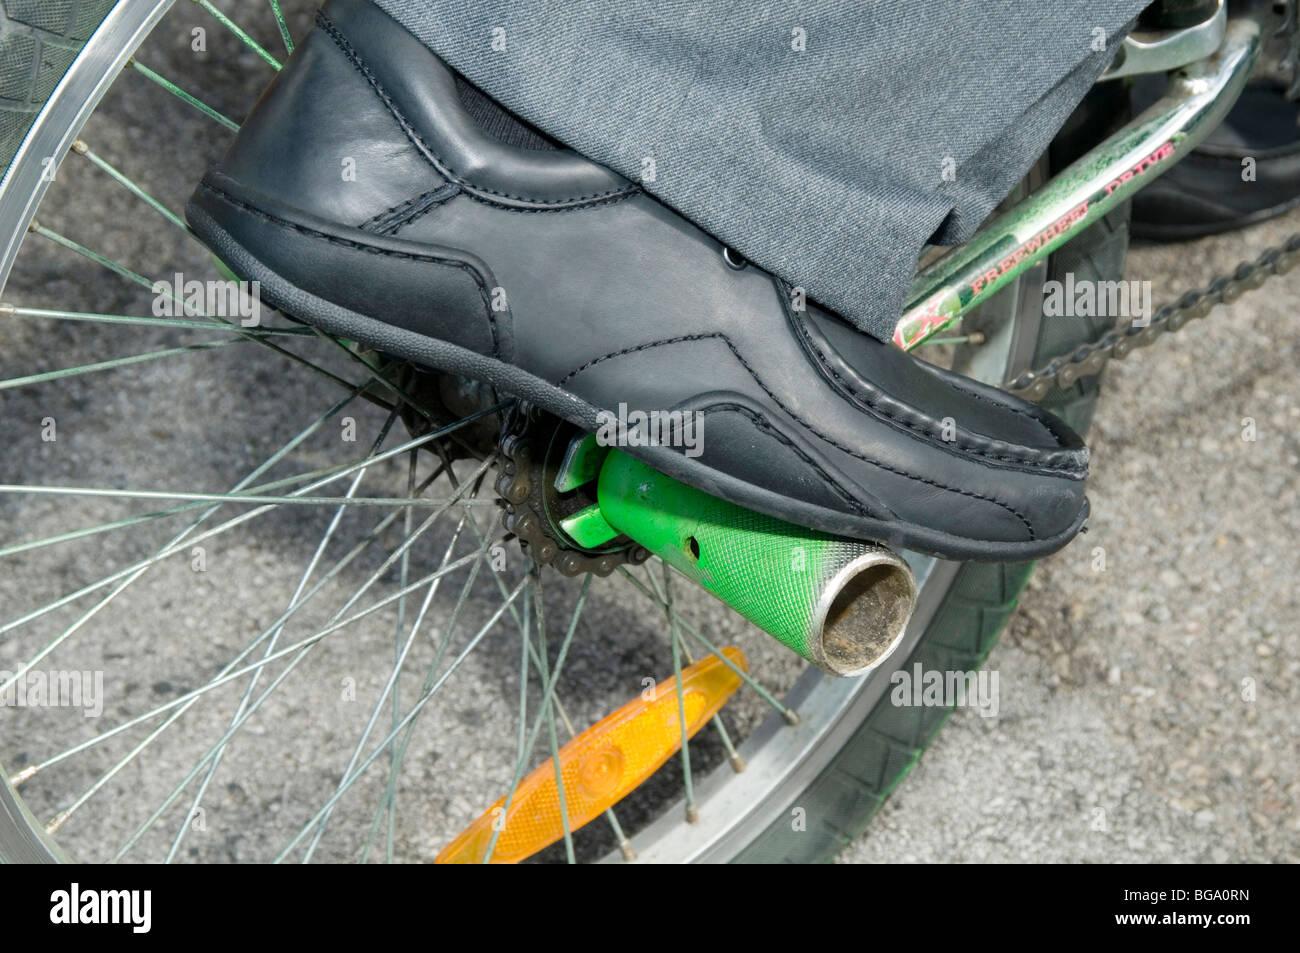 Trucco pioli bmx bike bike ciclo posteriore Pedane pedana piedi pioli piedi feetpeg feetpegs acrobazie stunt raggi Immagini Stock